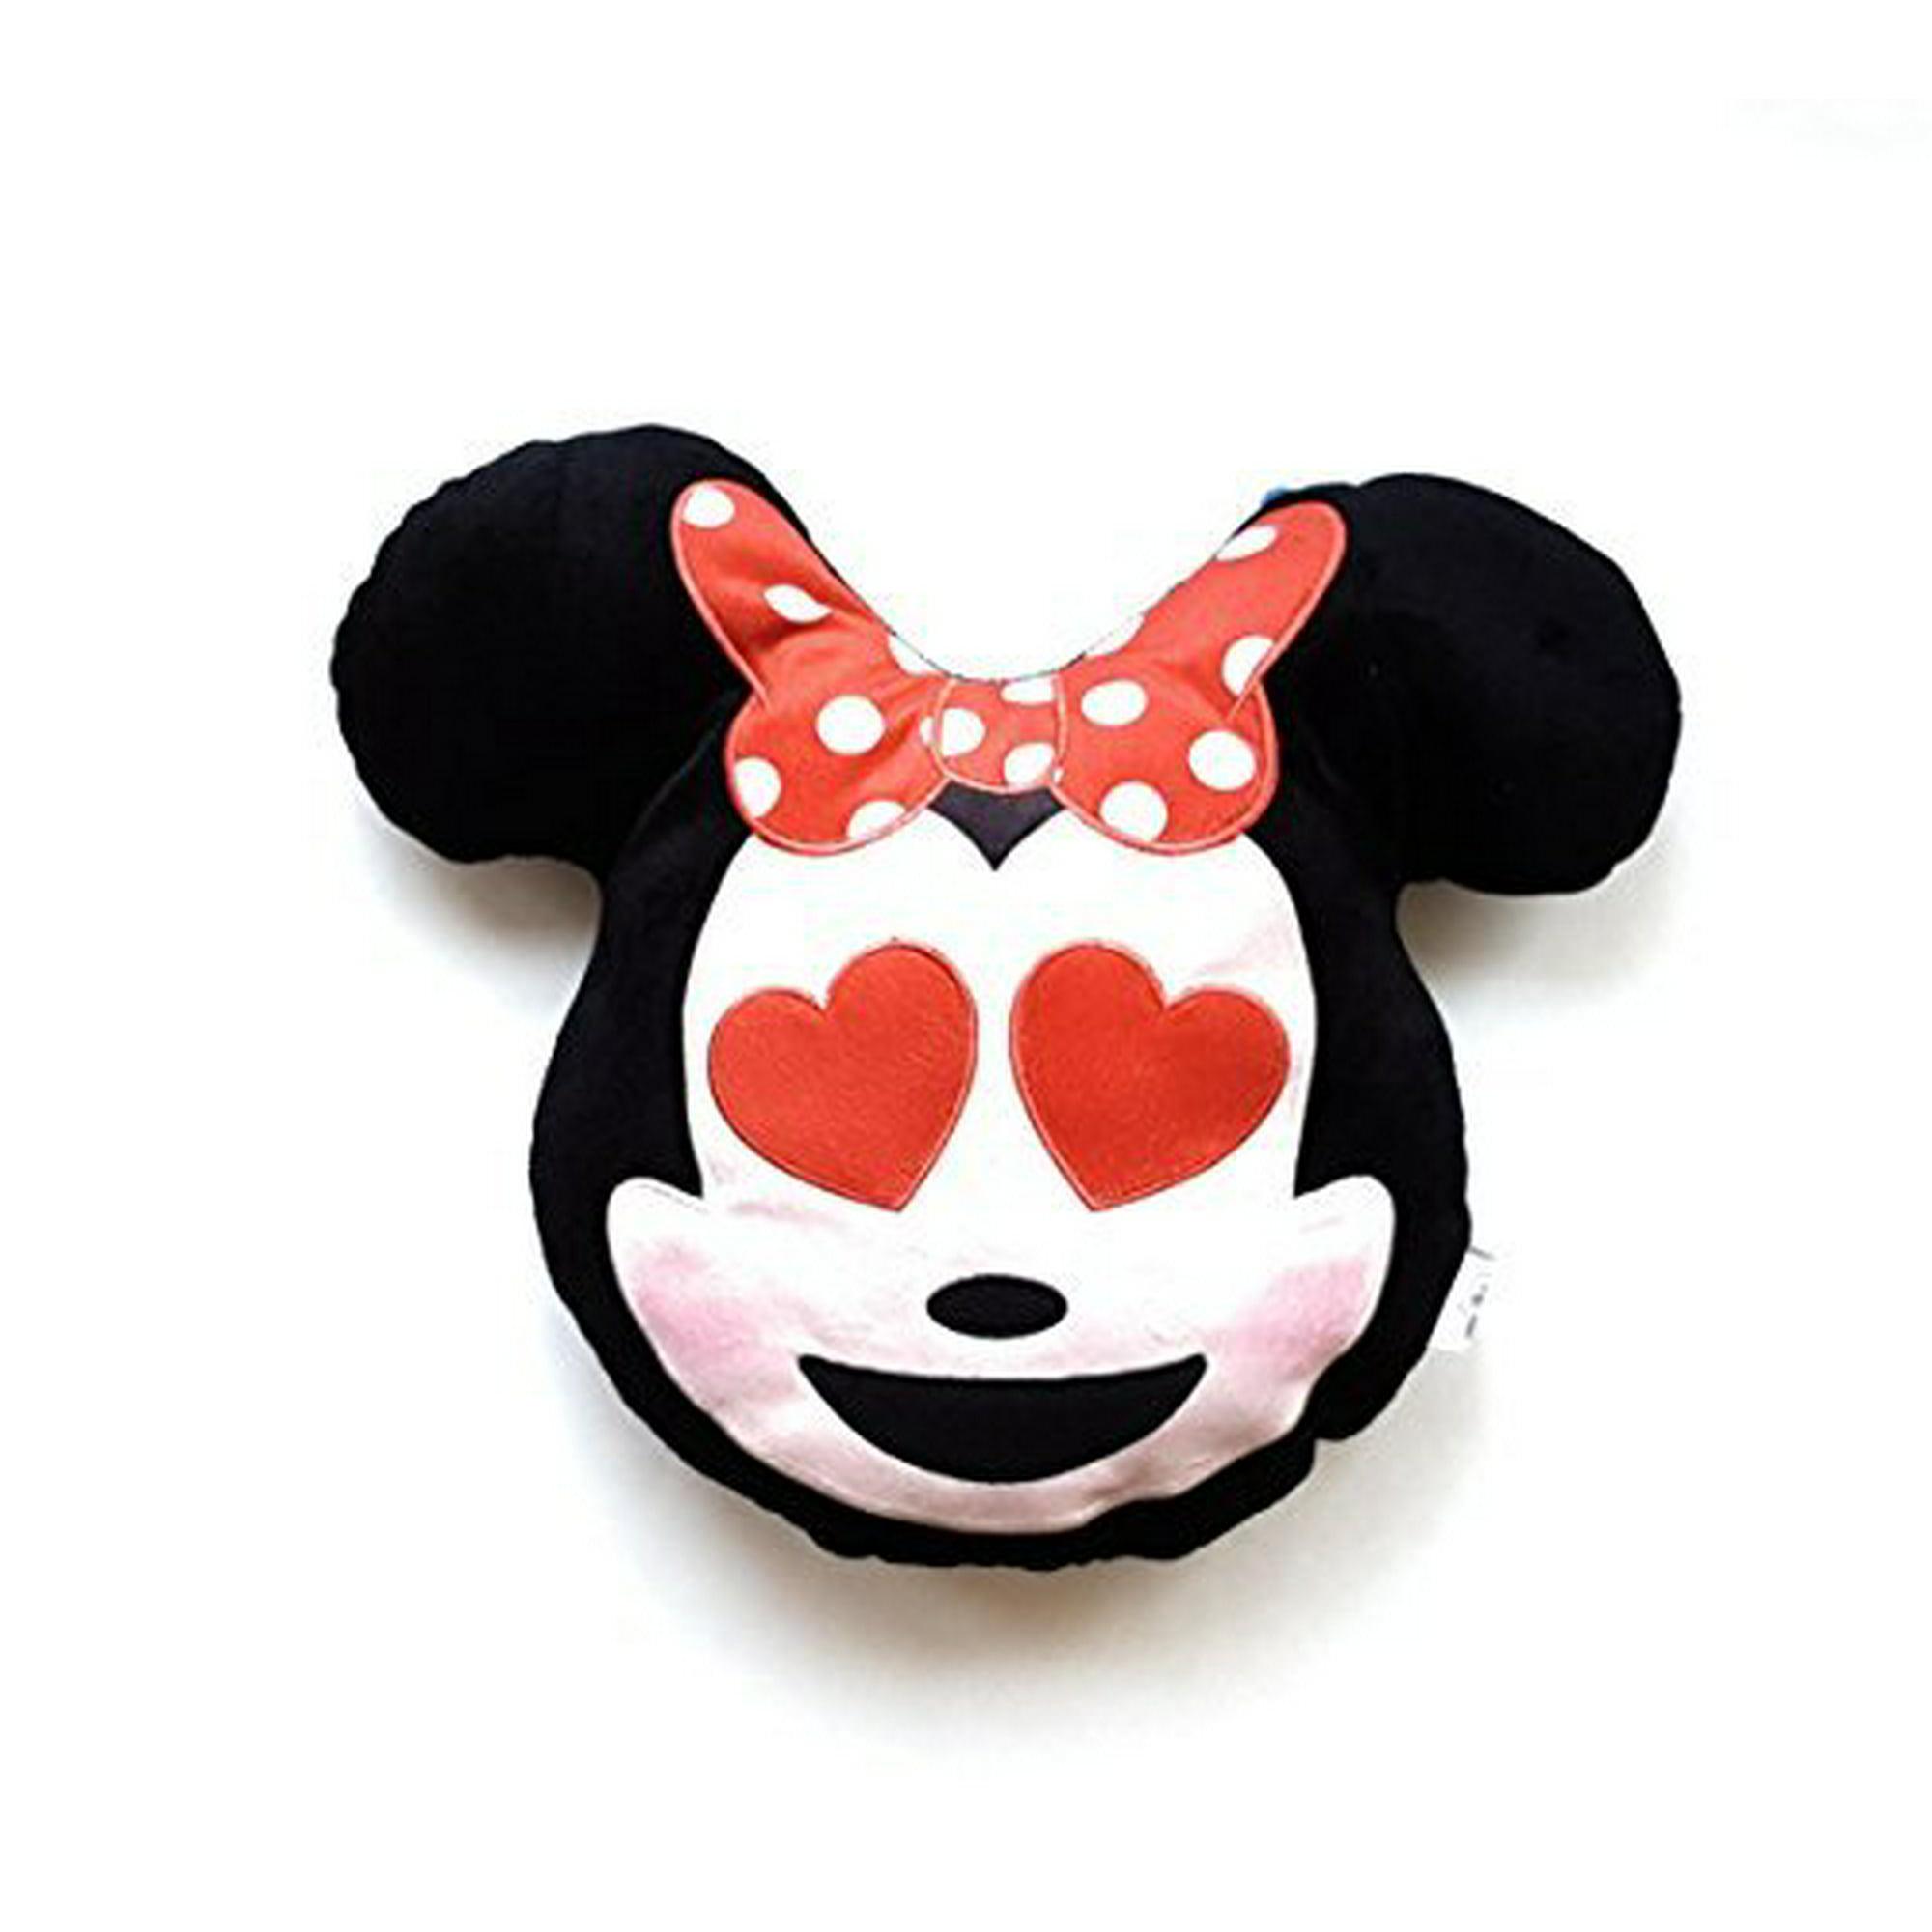 Disney Emoji Plush Pillow - Minnie - Heart Face Emoji | Walmart Canada